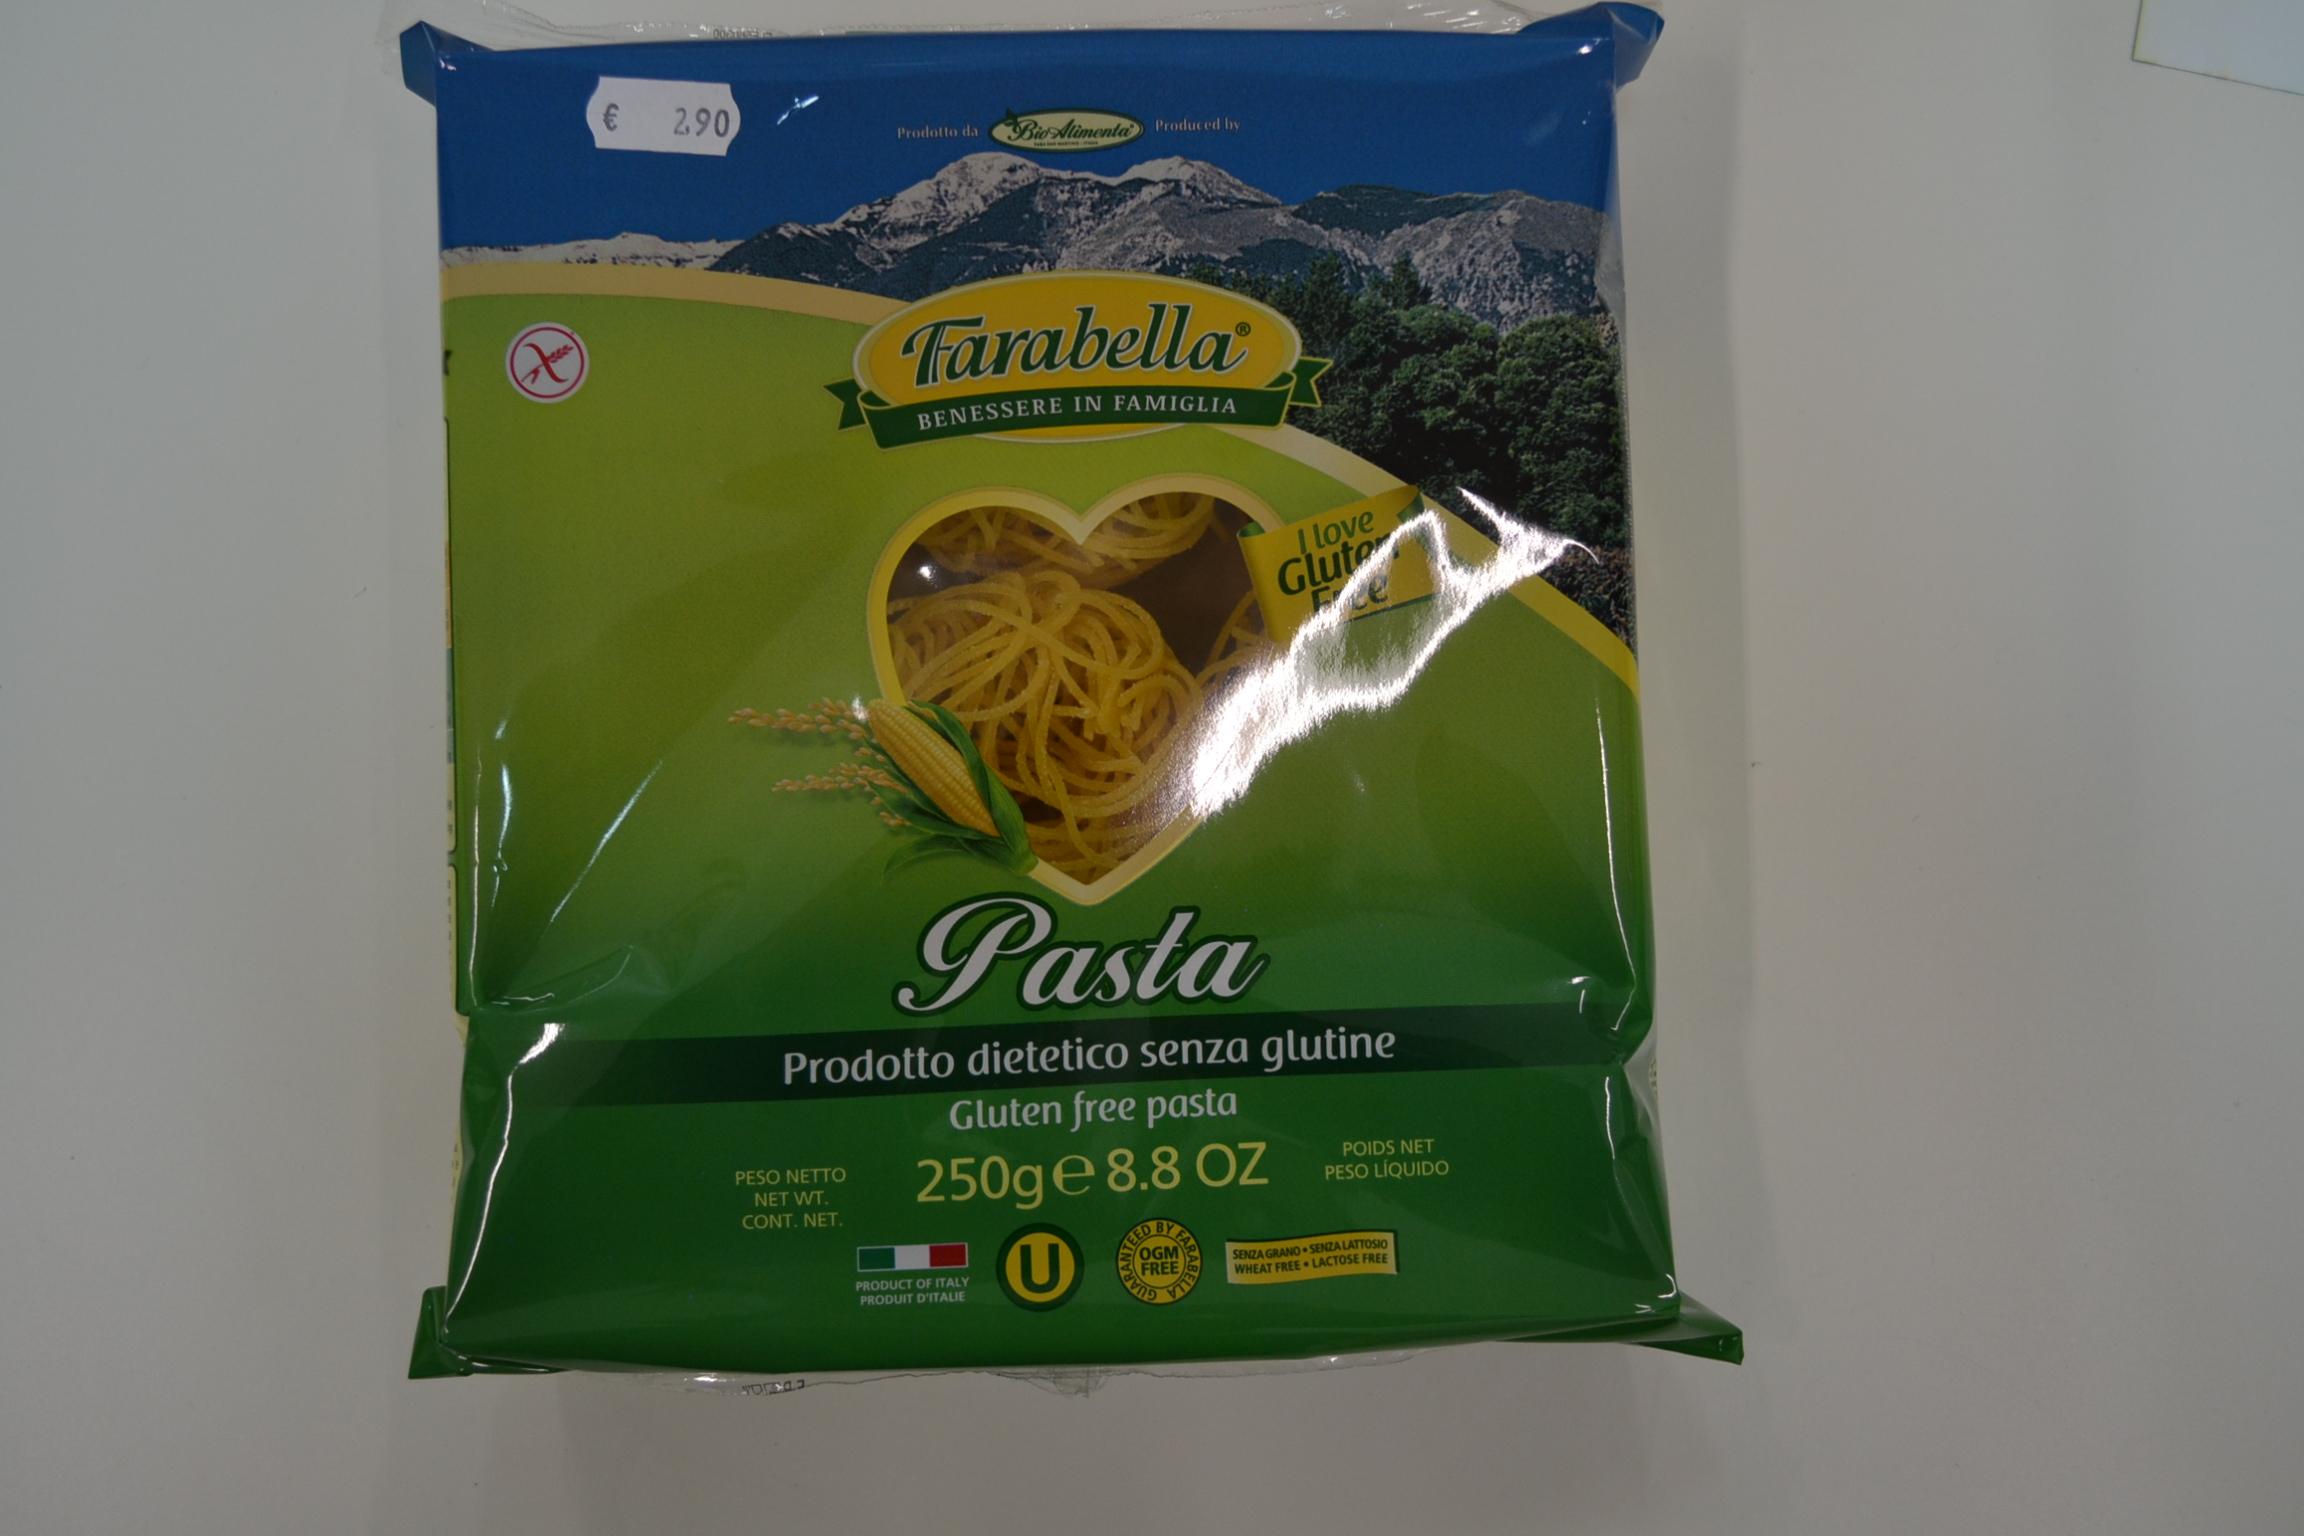 Pasta FARABELLA € 2,90